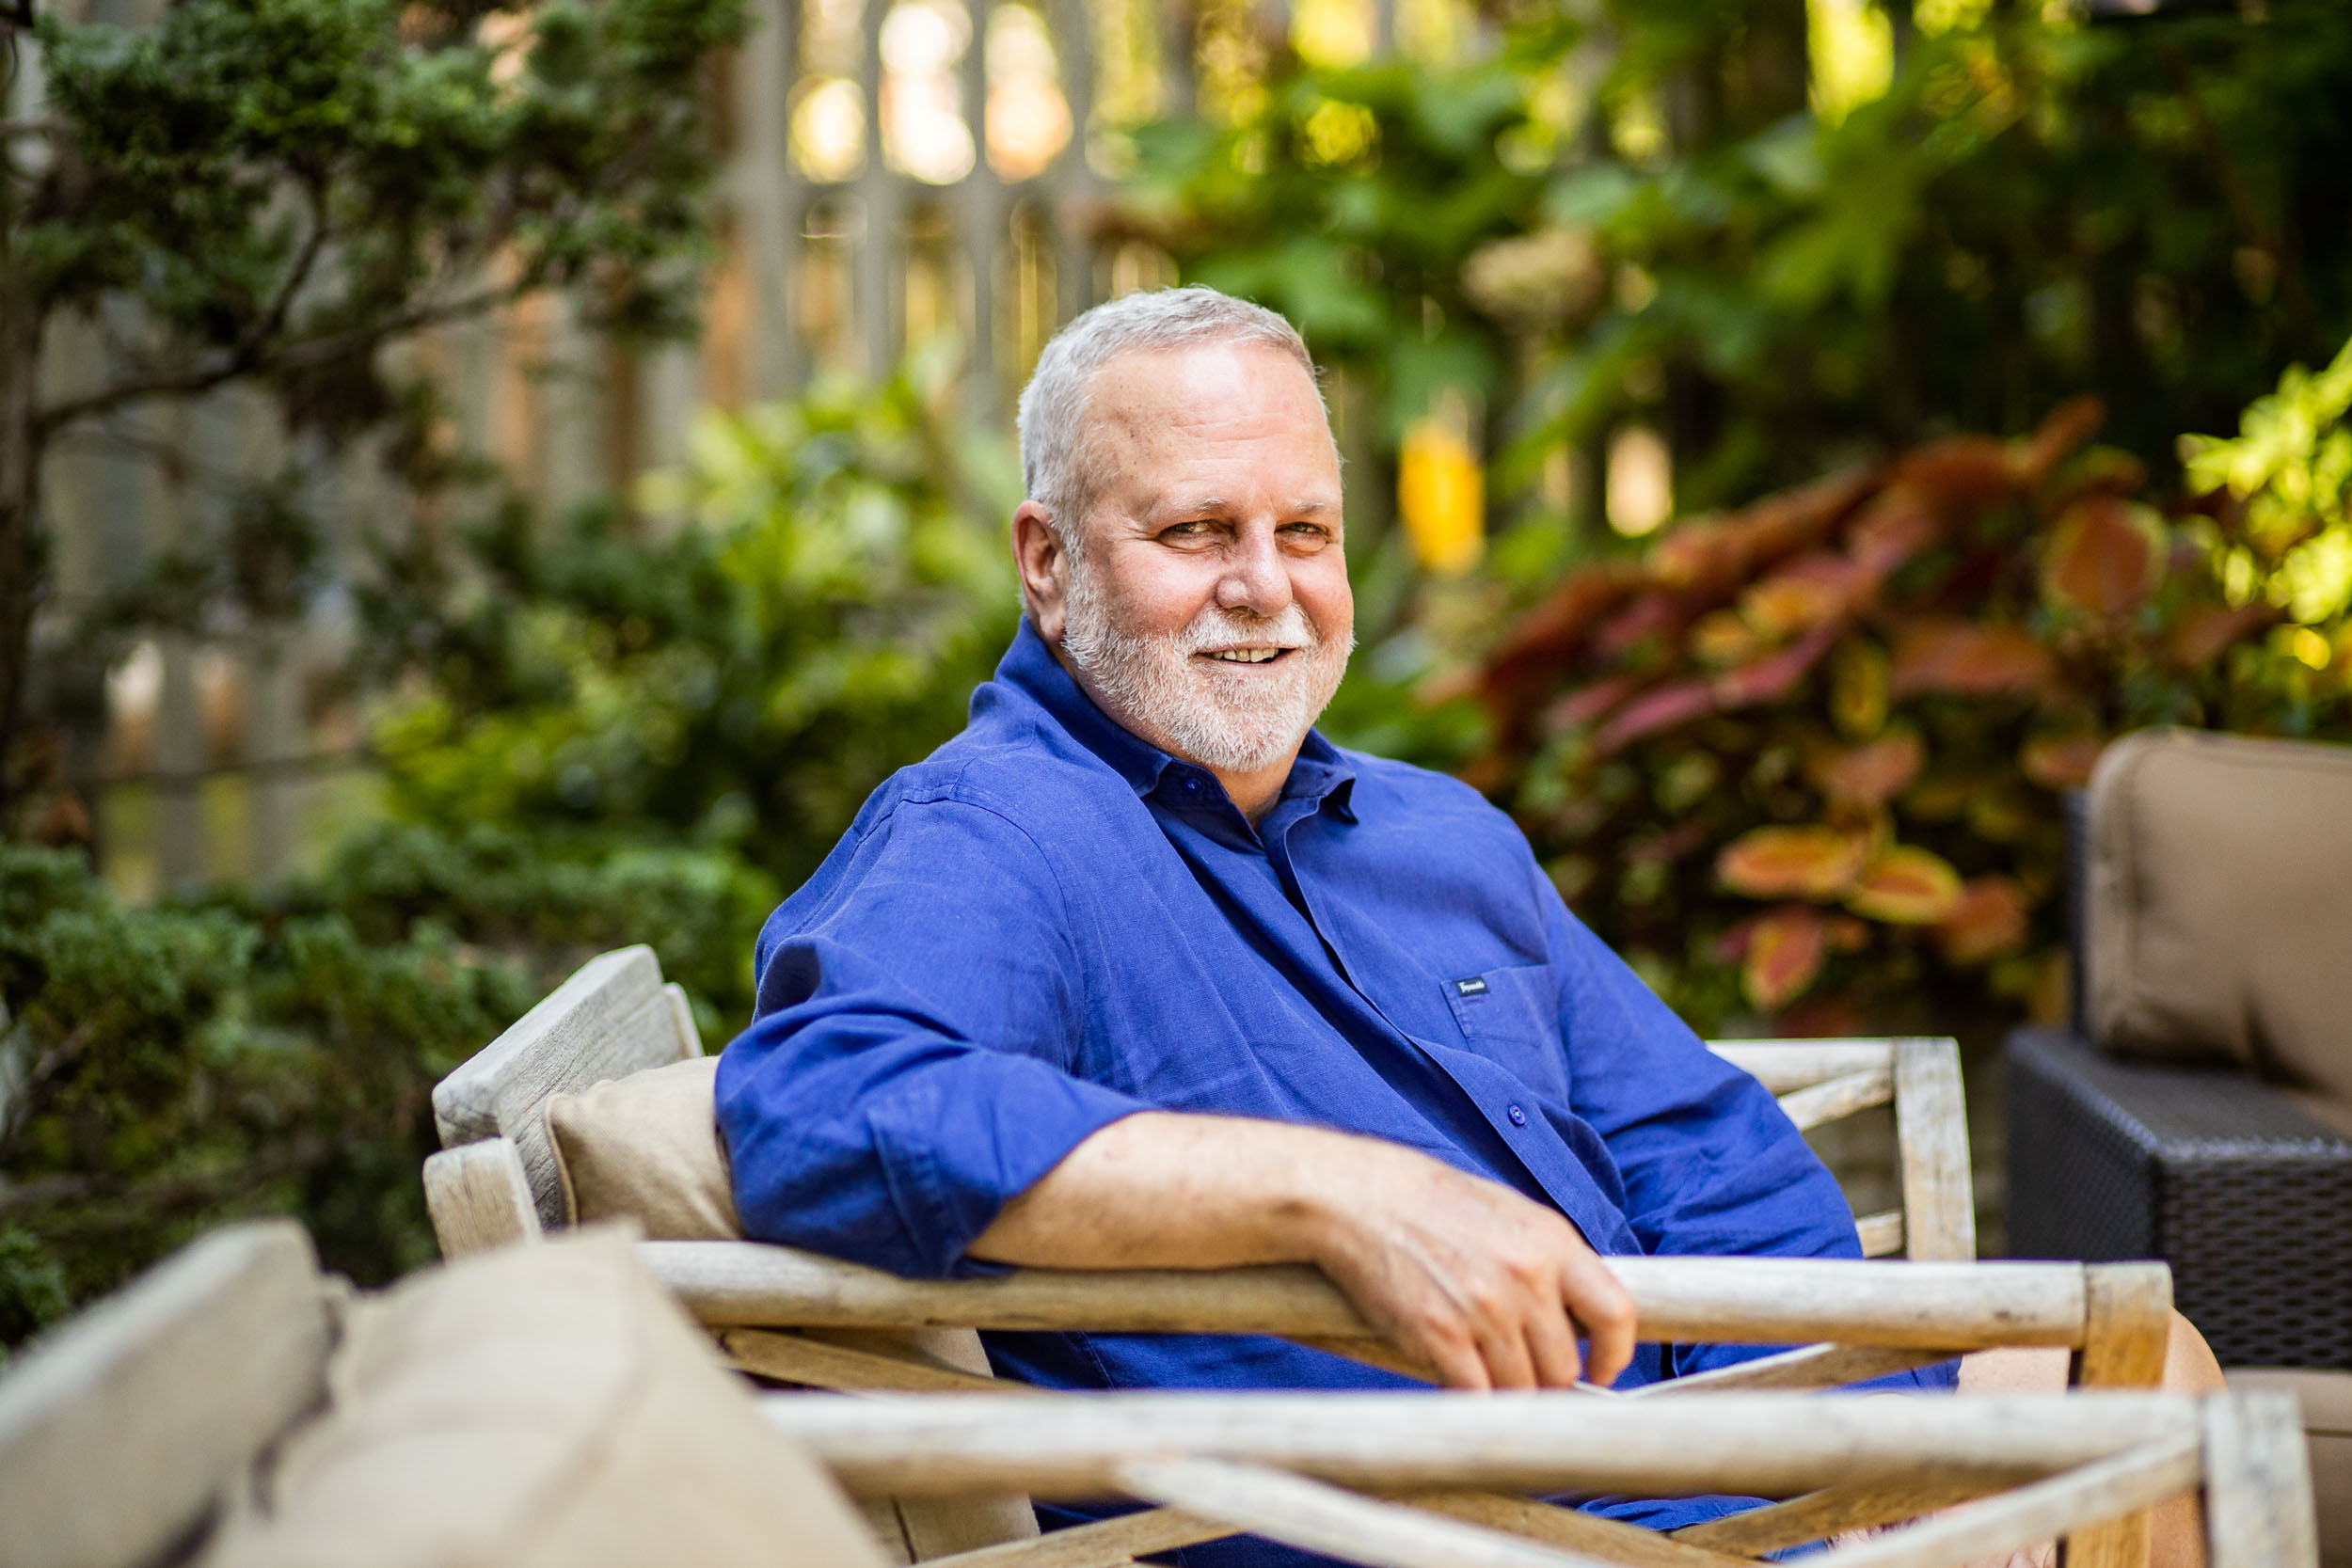 Chevy Chase MD Backyard Family Portraits Maryland Photography Tara Parekh Photography -01.jpg